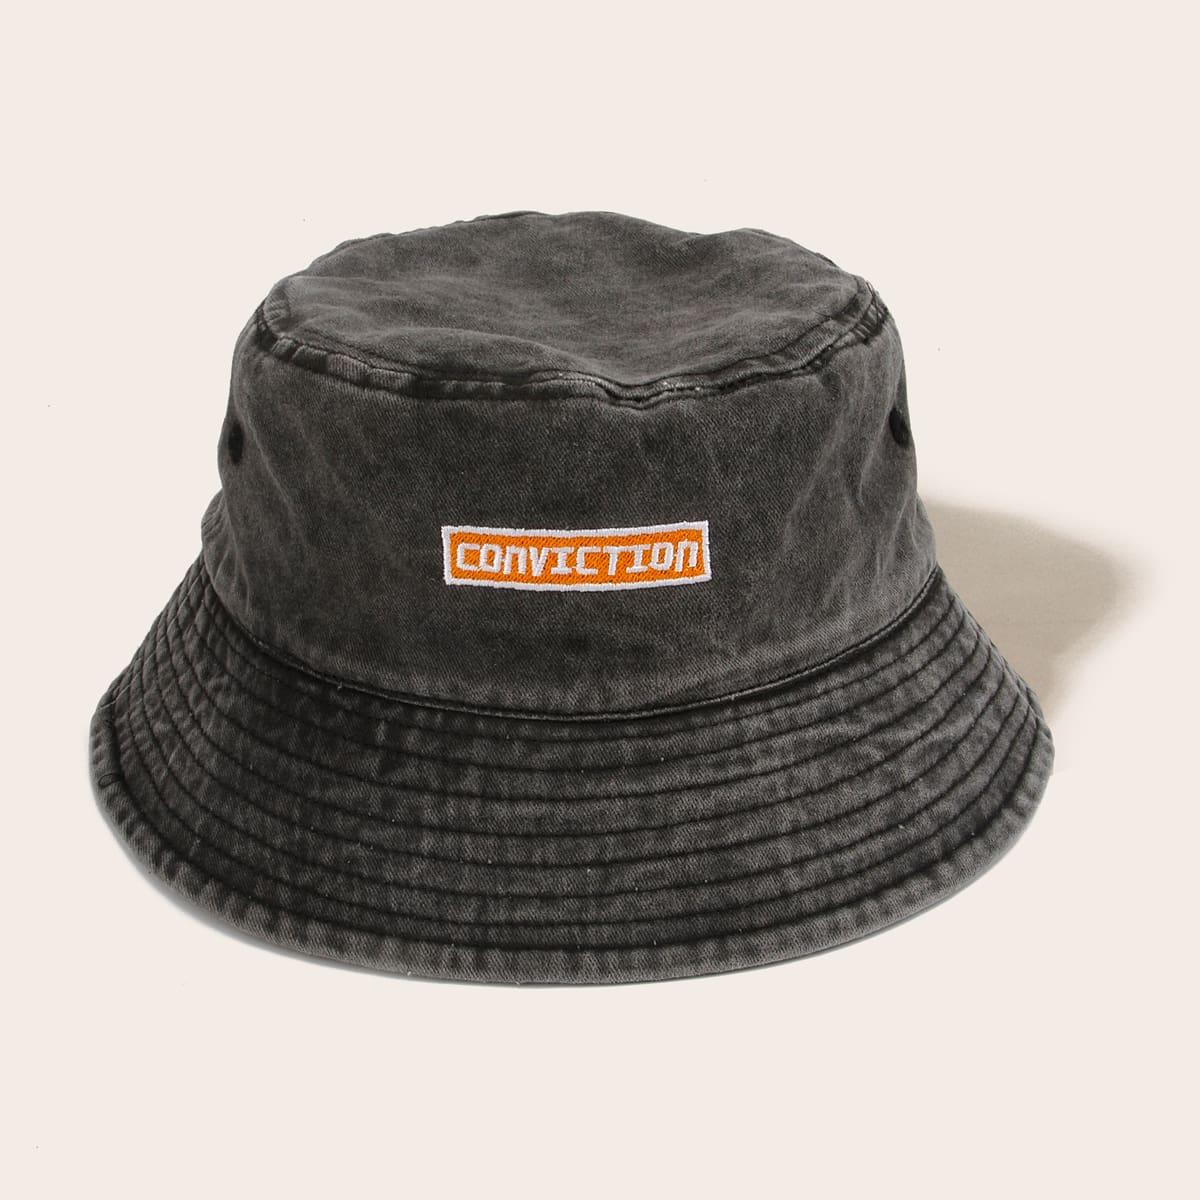 Шляпа-ведро с вышивкой